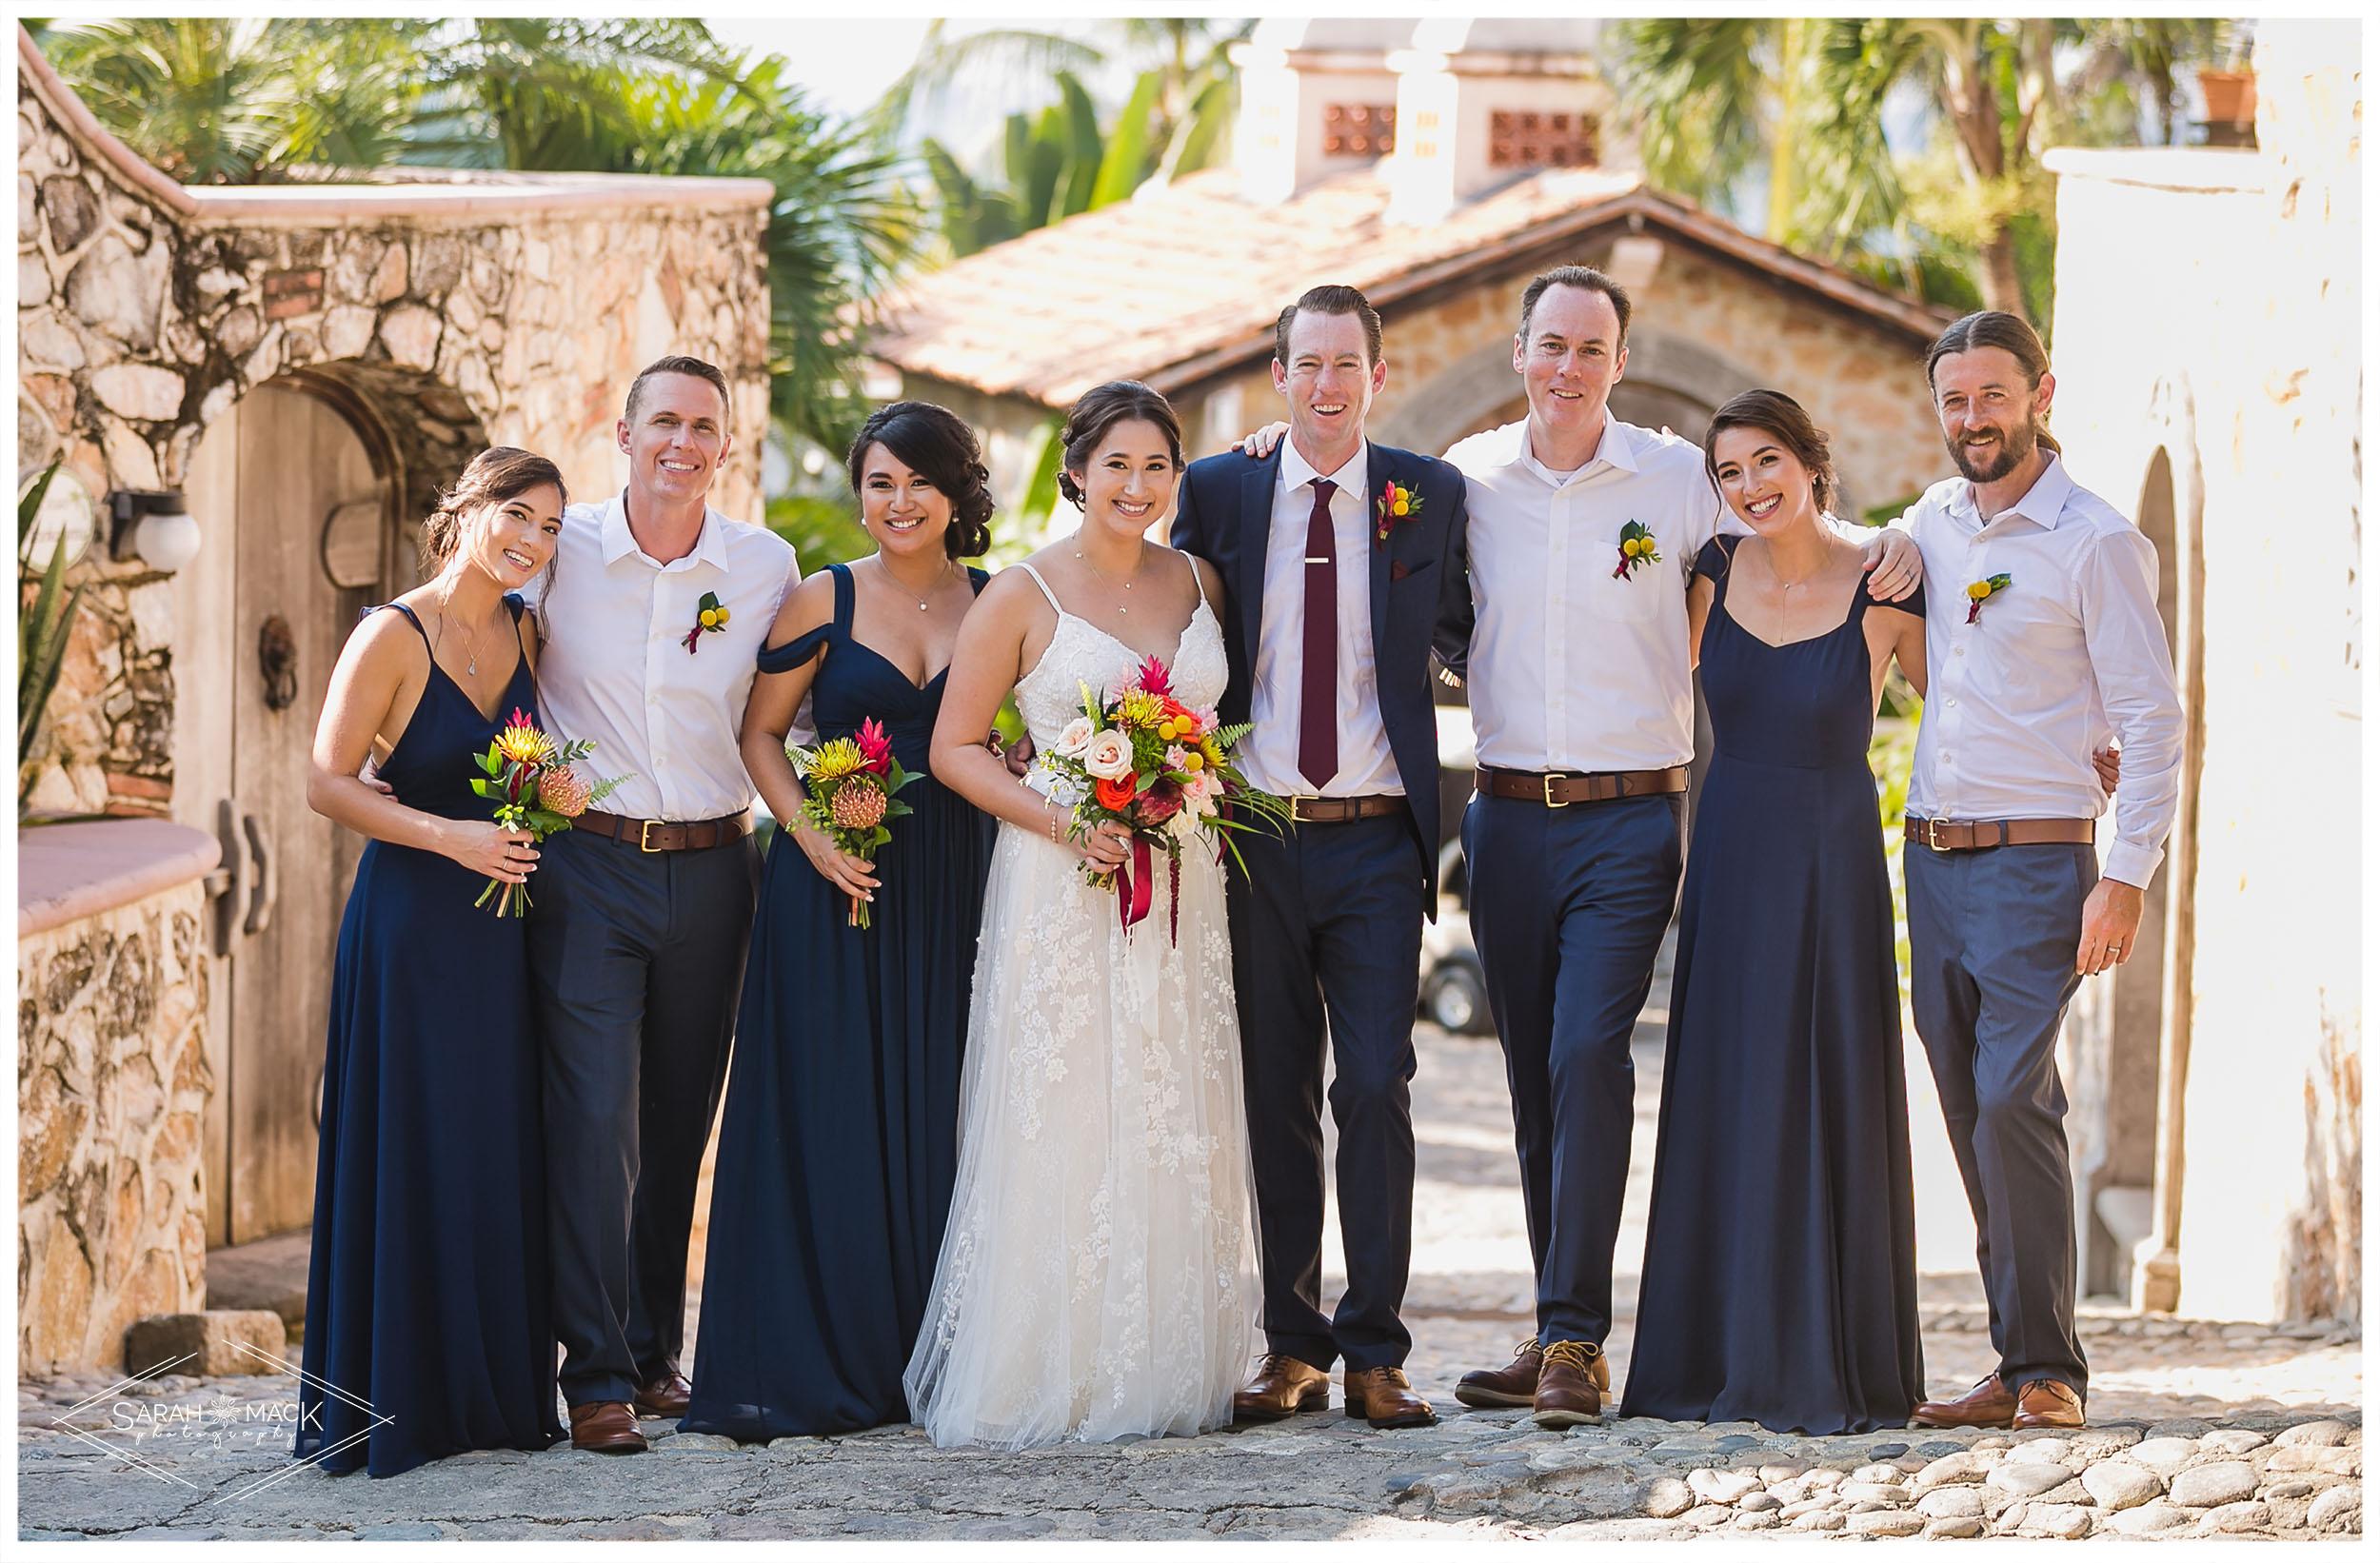 ES-Flor-de-Playa-Sayulita-Wedding-Photography-22.jpg